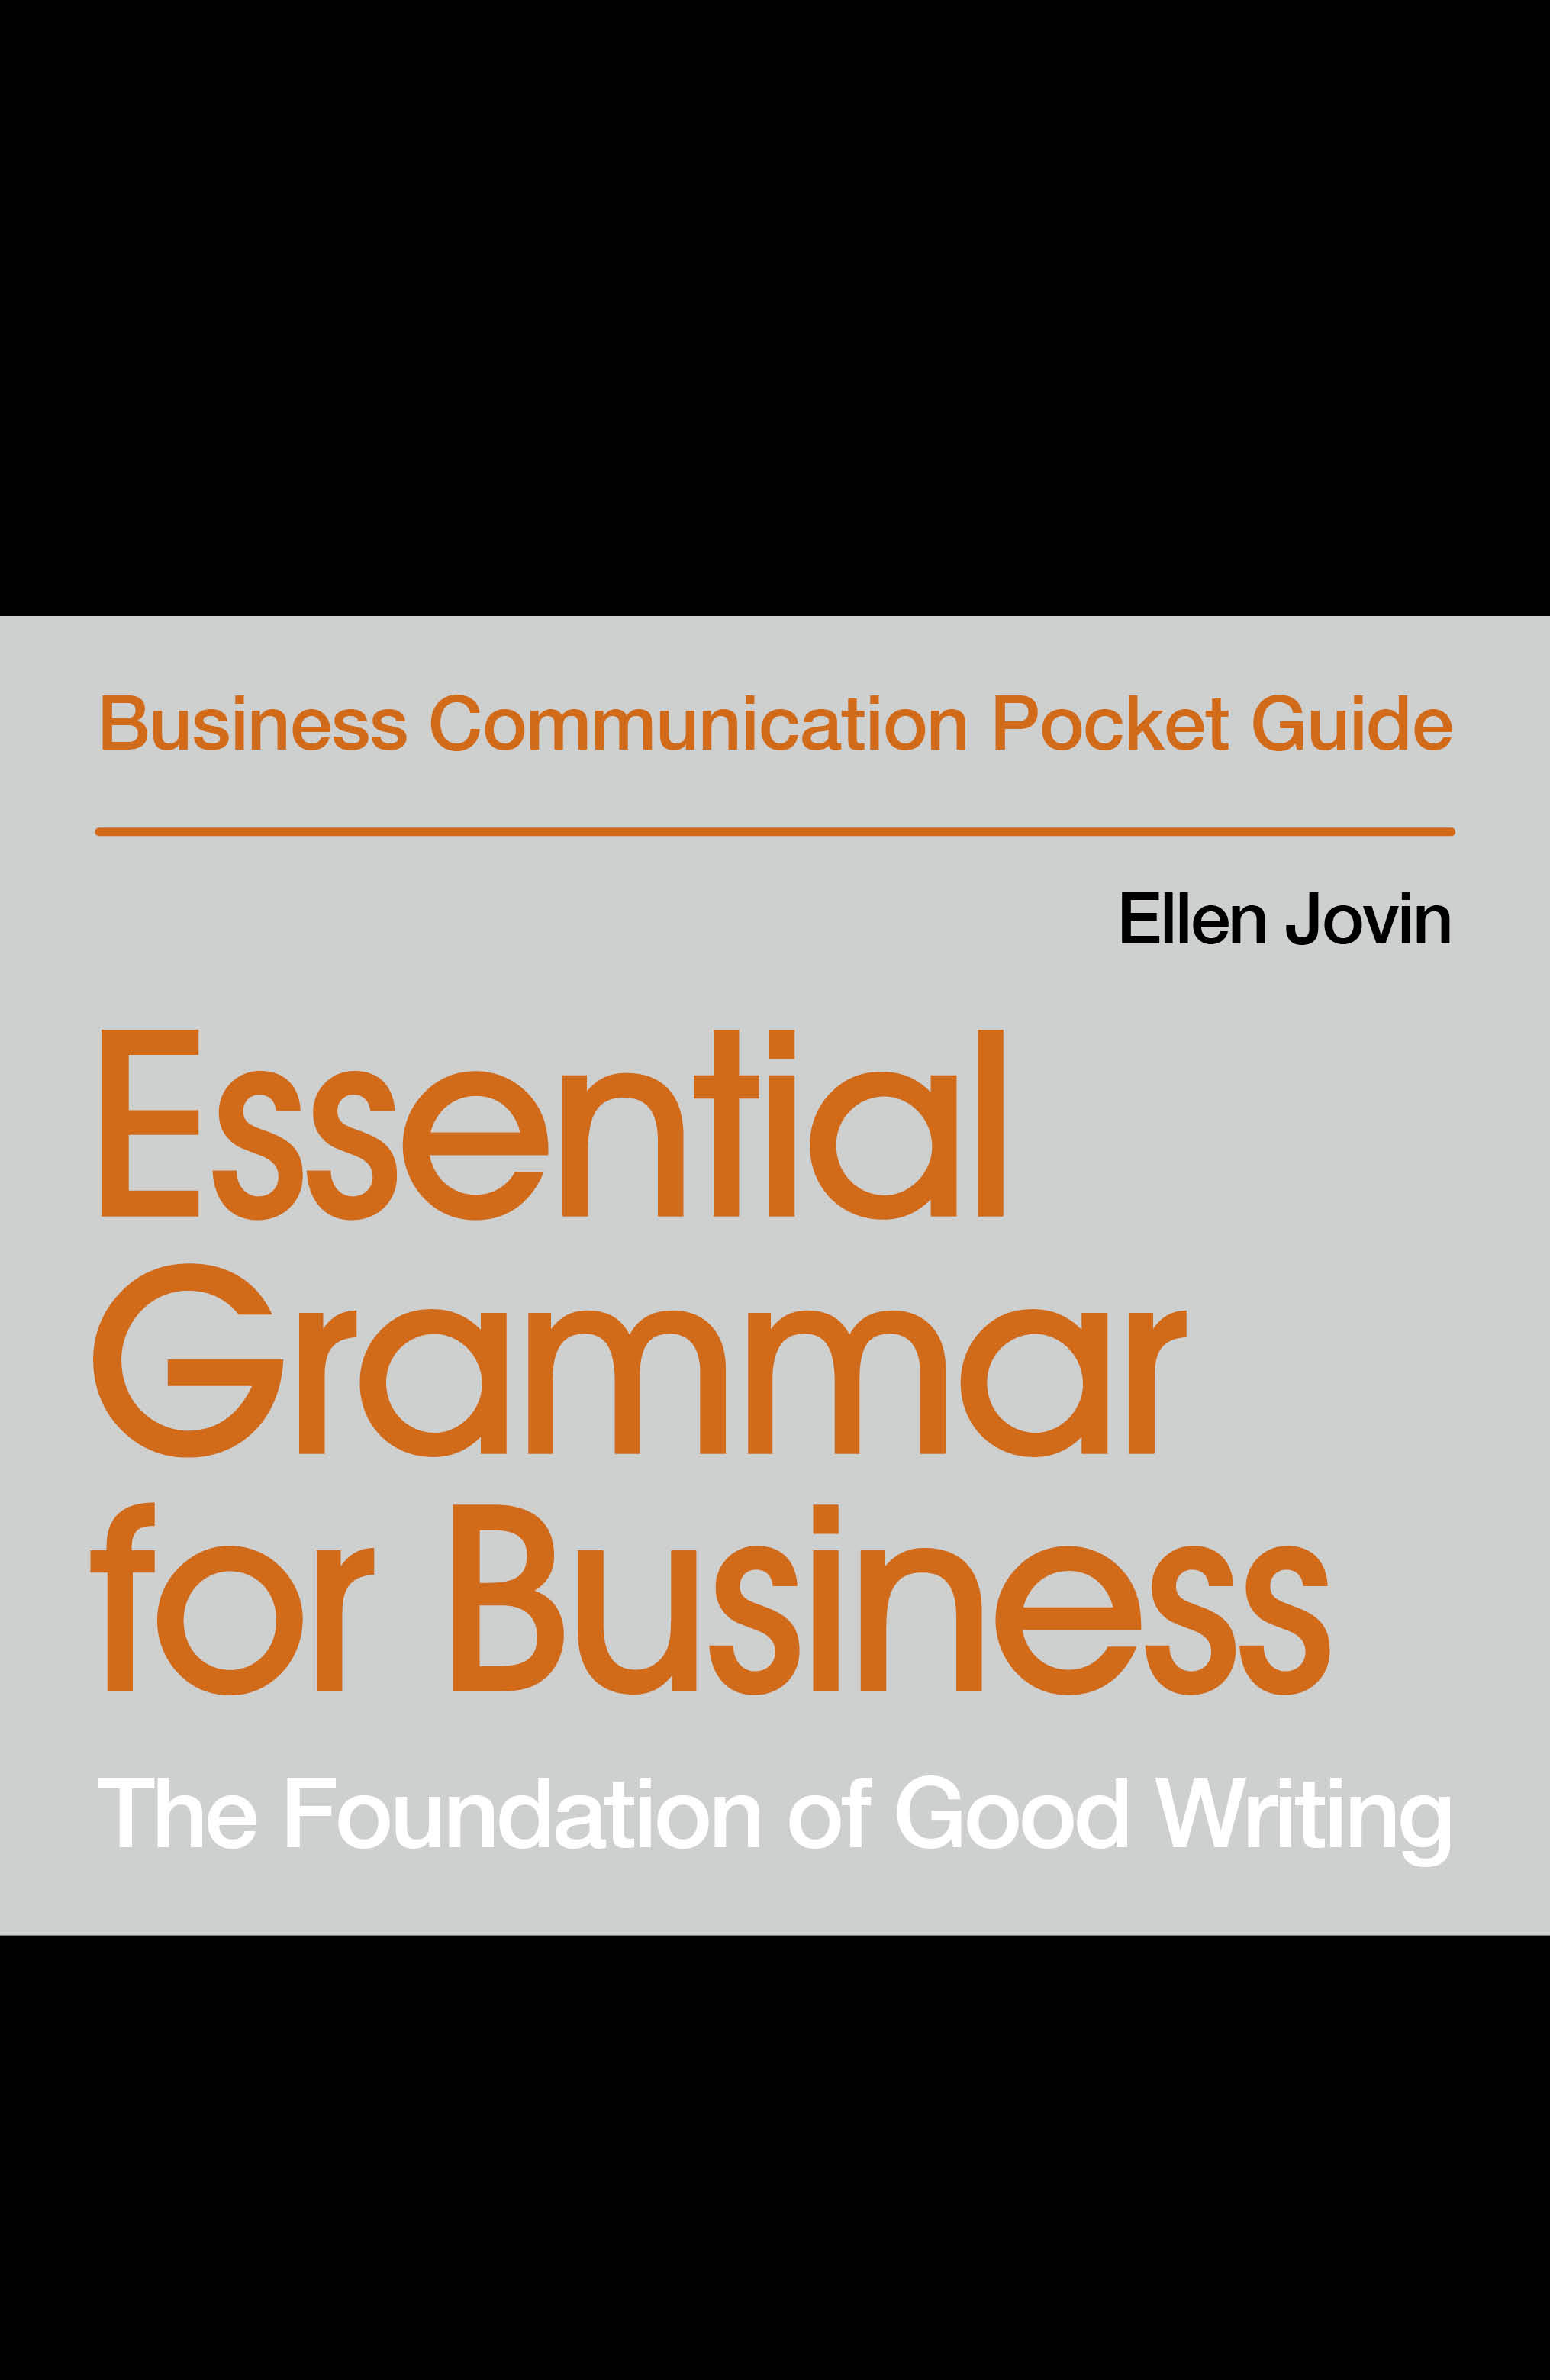 Business Communication Pocket Guide Series3.jpg